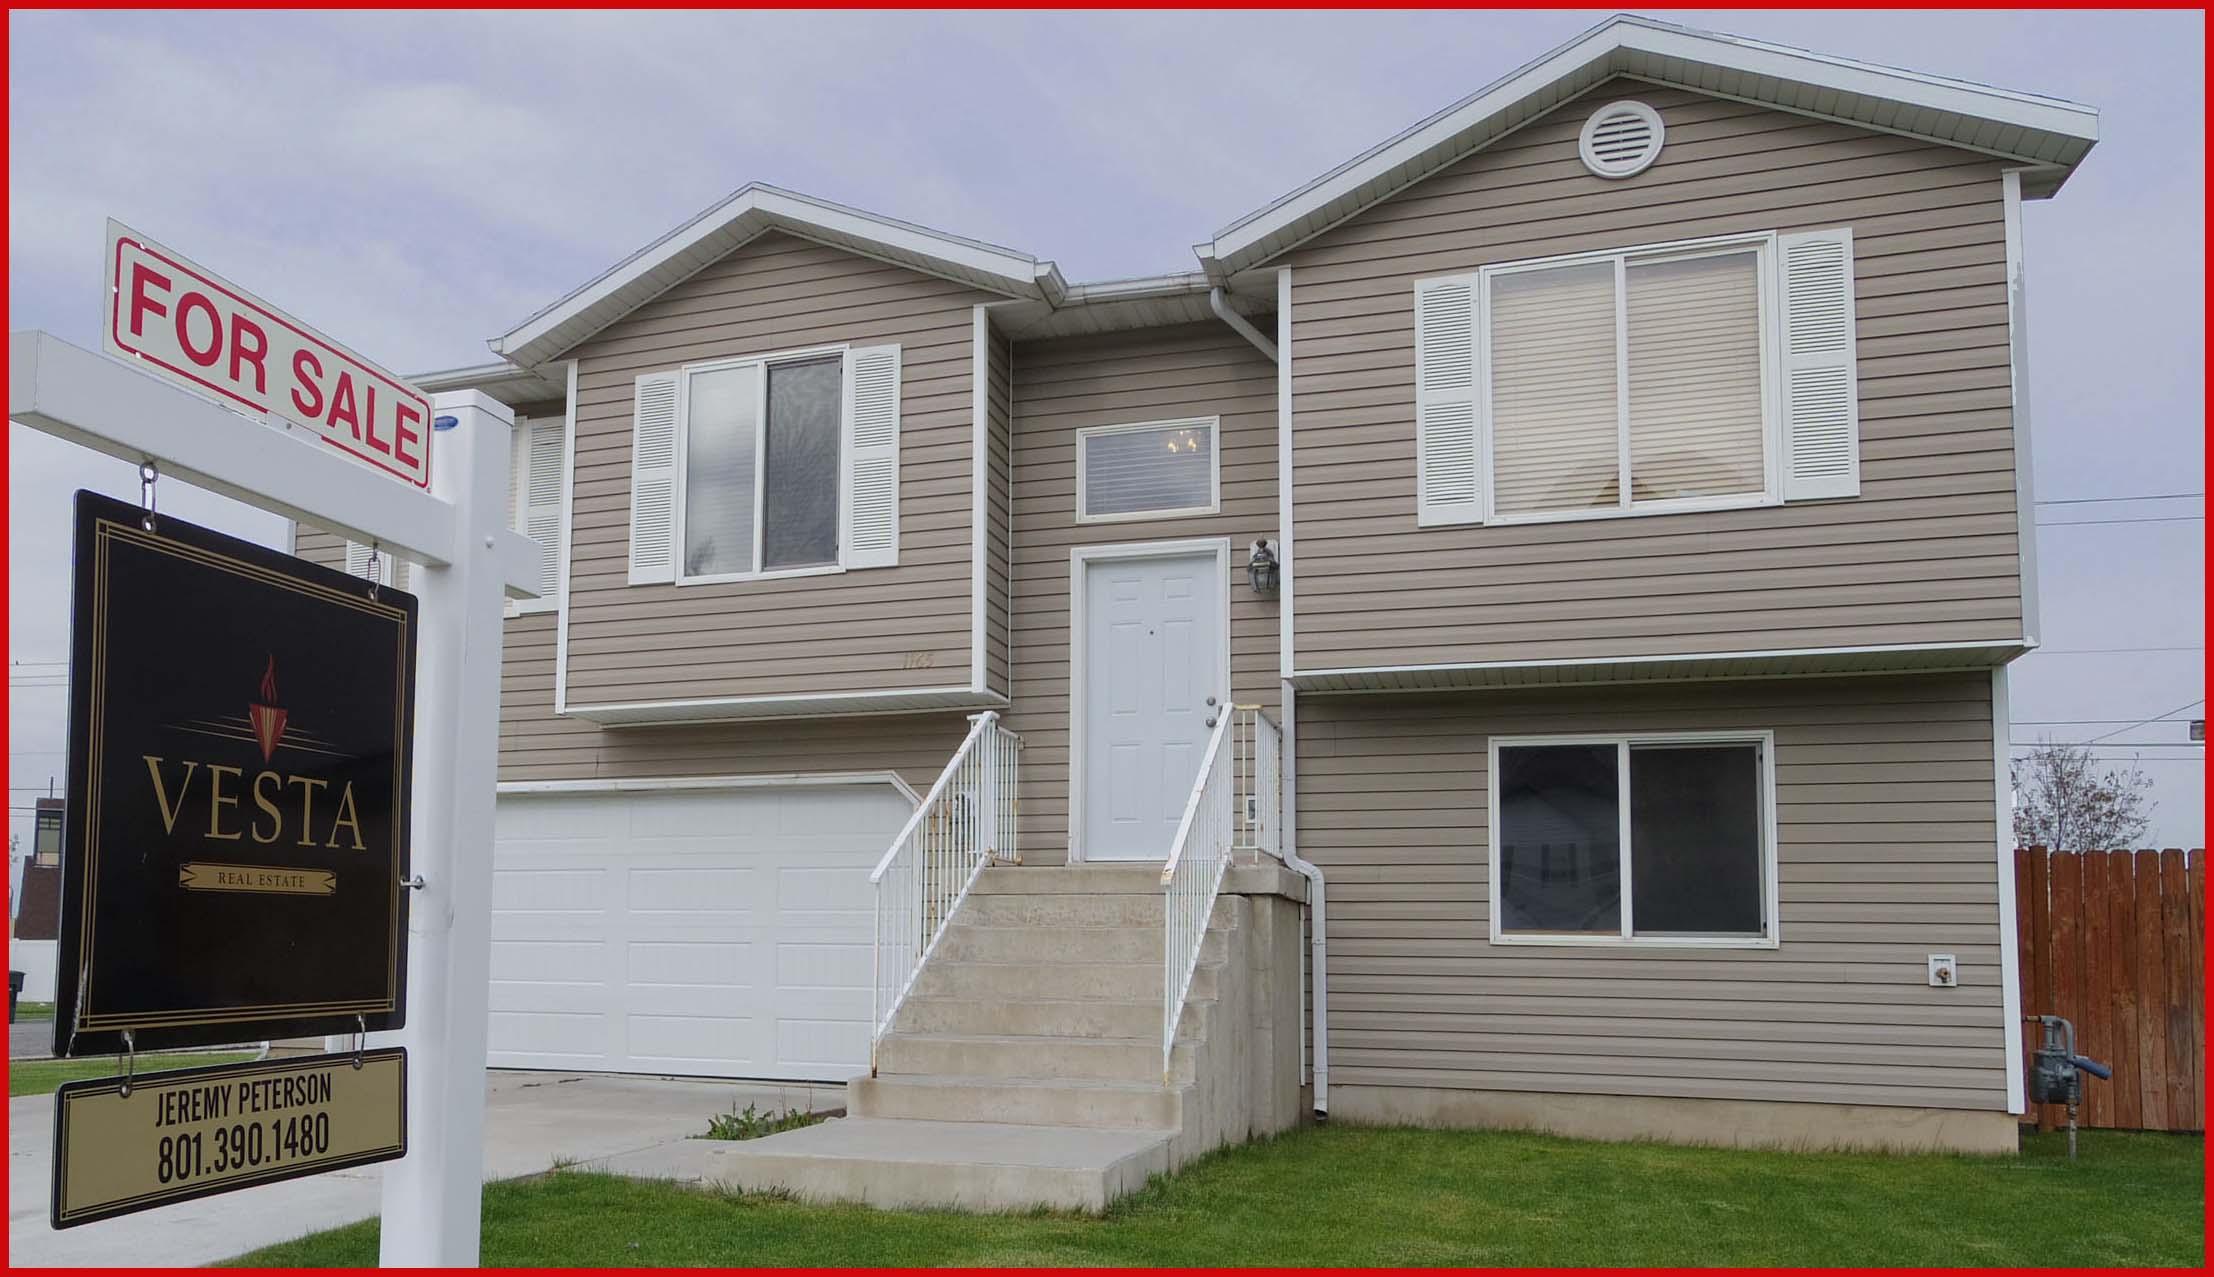 Home For Sale - Vesta Sign In Yard b